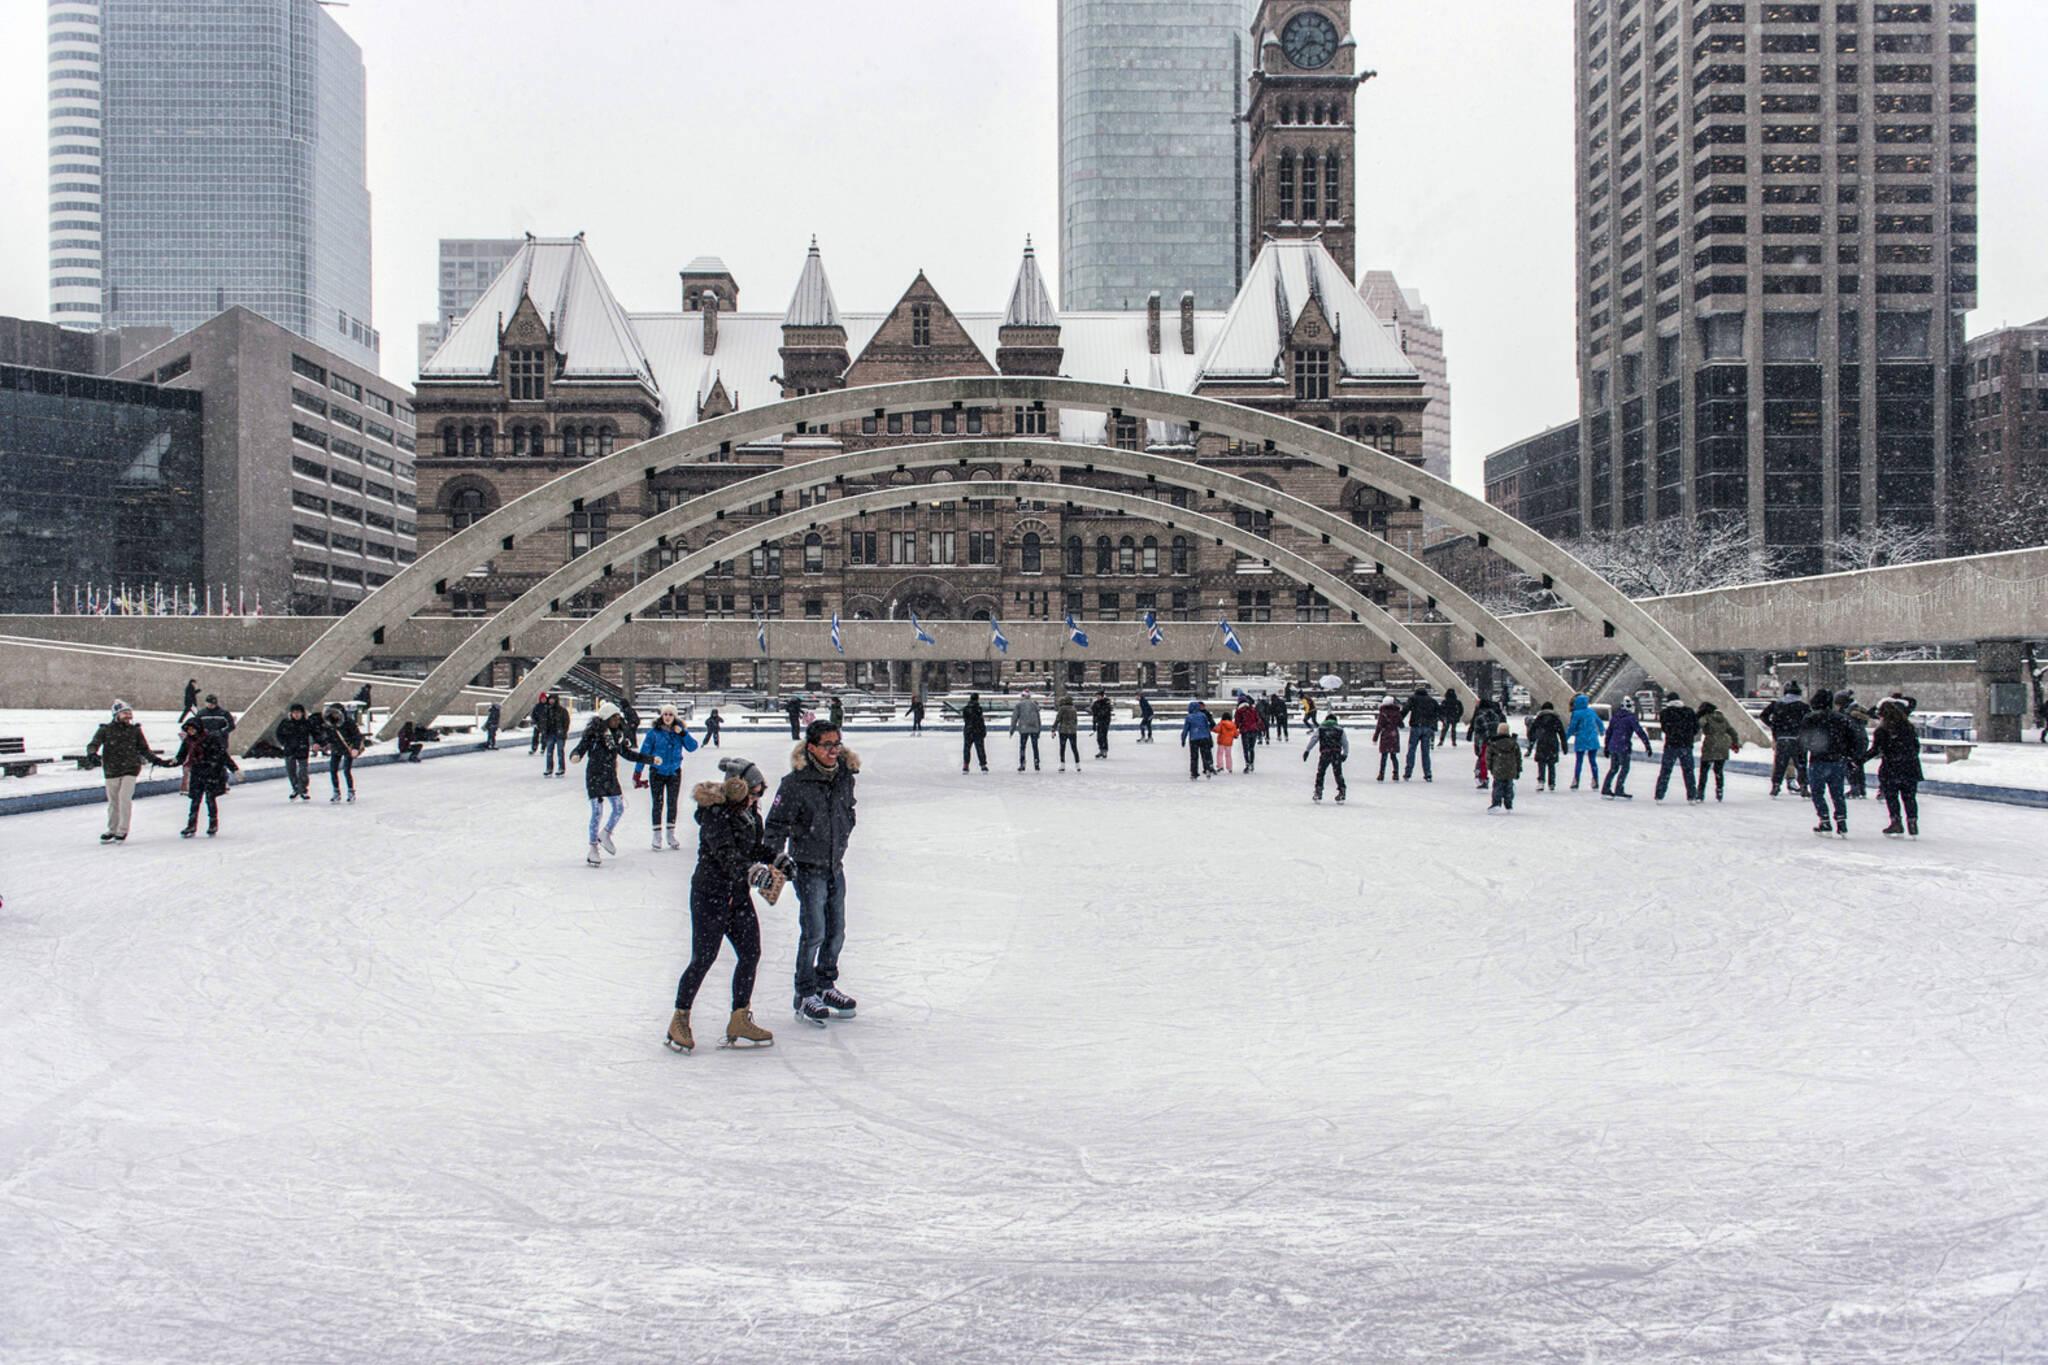 Roller skating rink etobicoke - Outdoor Skating Rinks Toronto